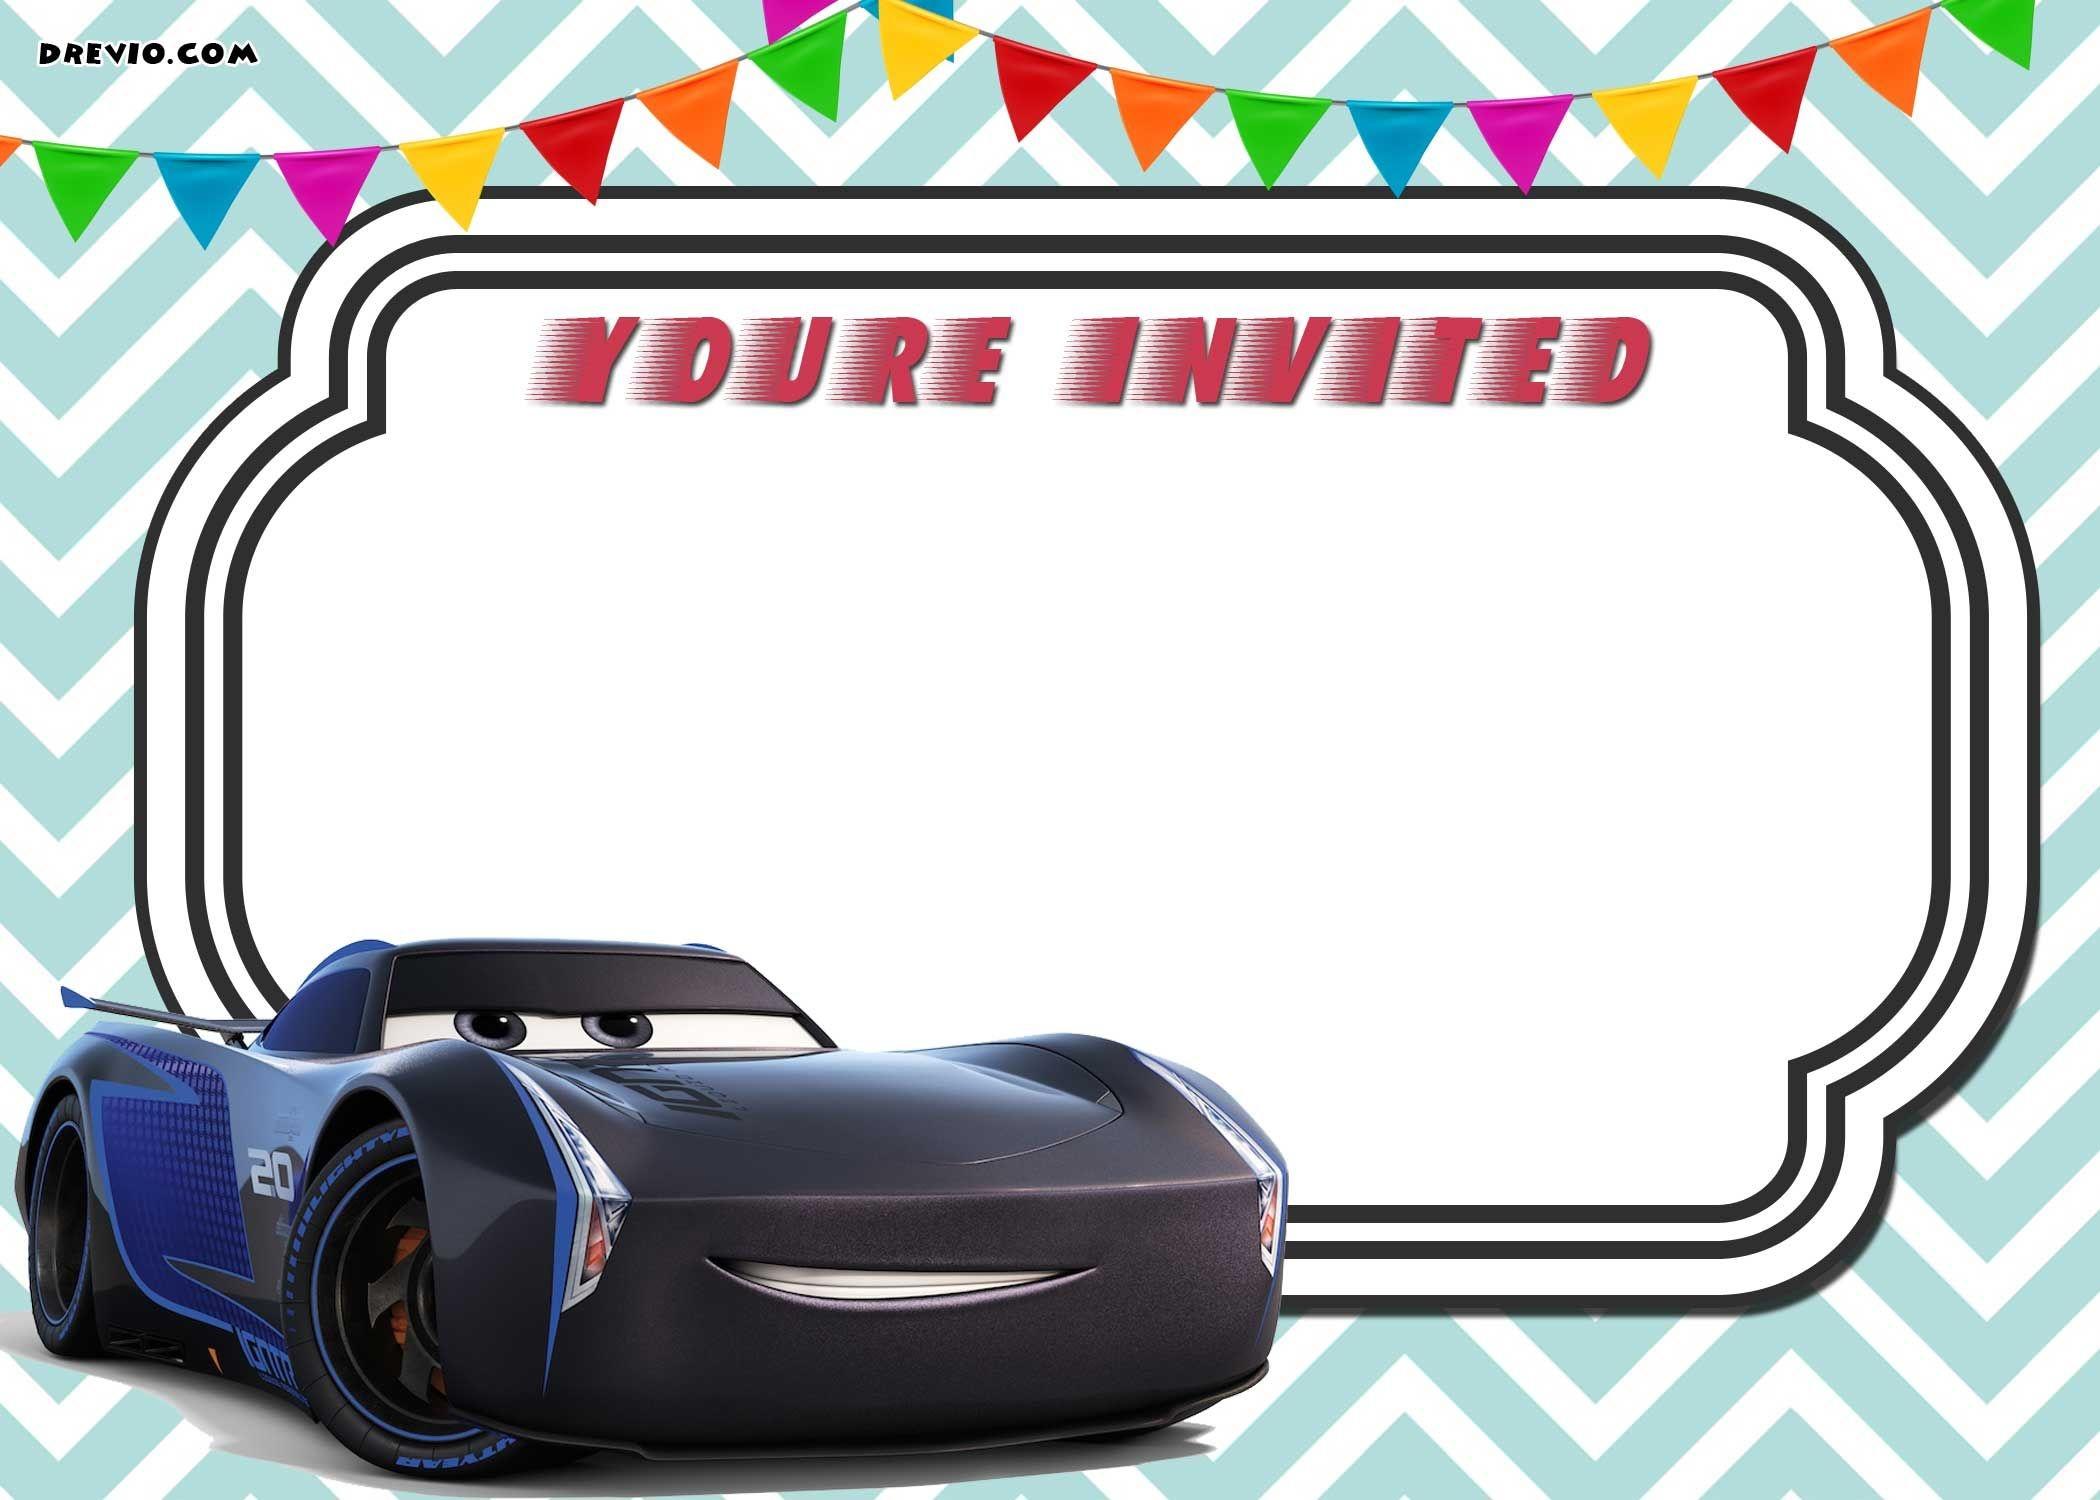 Free Printable Cars 3 Lightning Mcqueen Invitation Template   Free - Free Printable Car Template